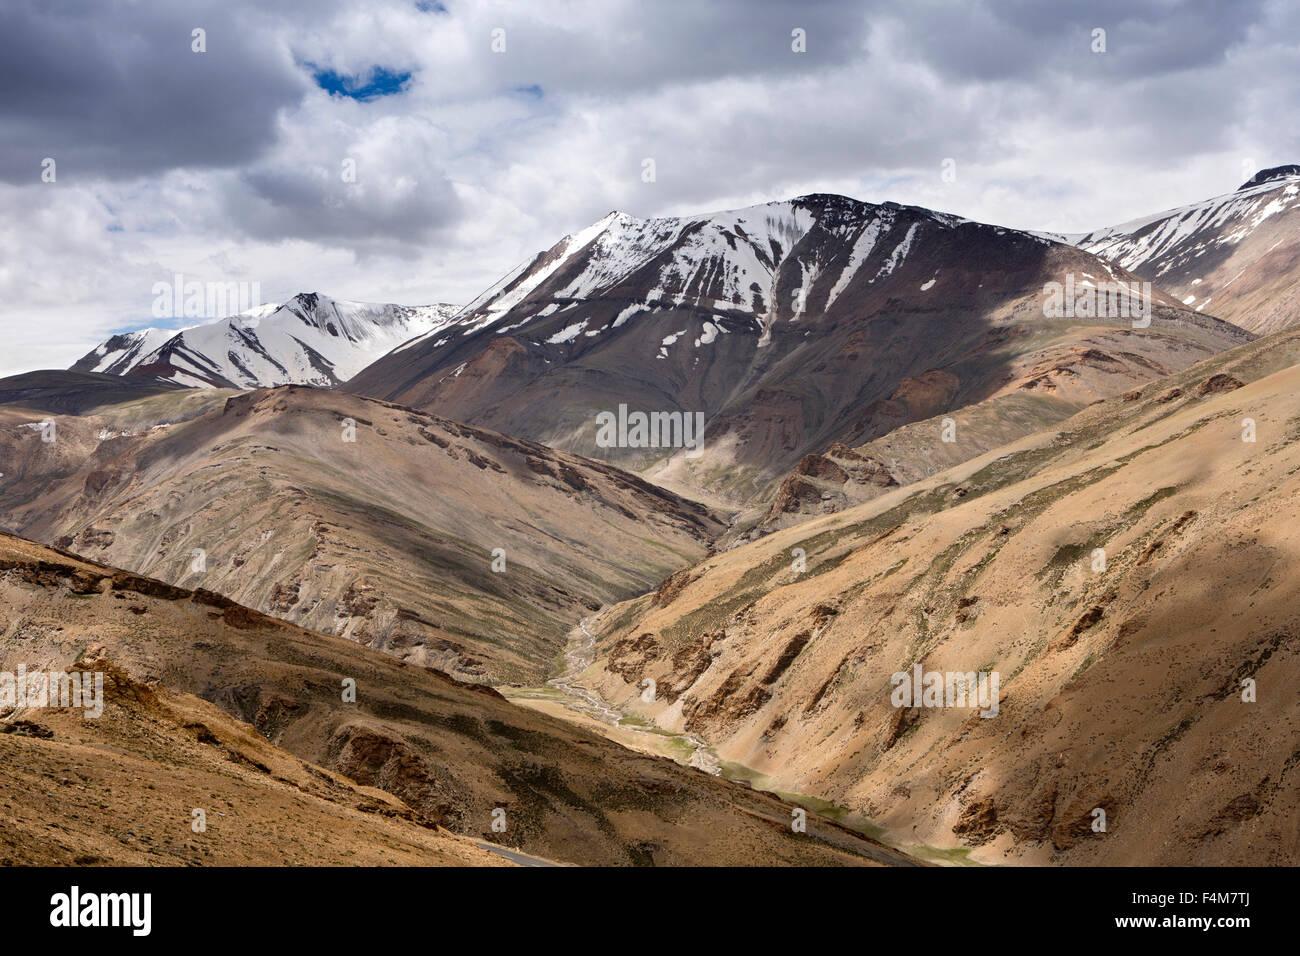 India, Jammu & Kashmir, Ladakh, Rumtse, snow capped mountains around Taglang La pass - Stock Image